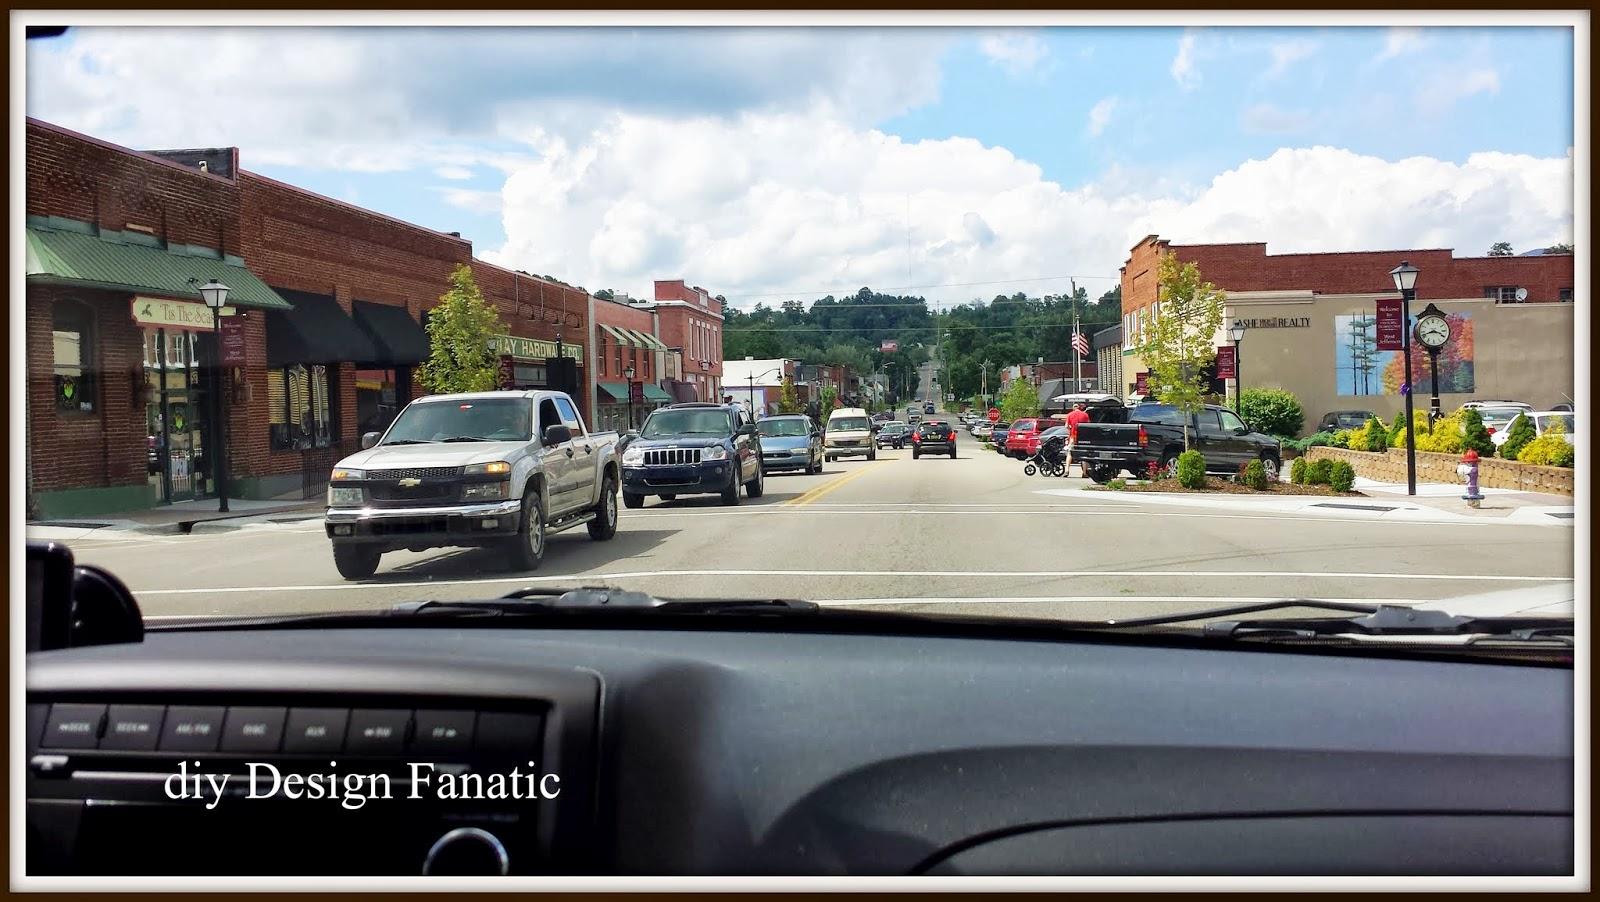 diy Design Fanatic: West Jefferson, North Carolinawest jefferson town